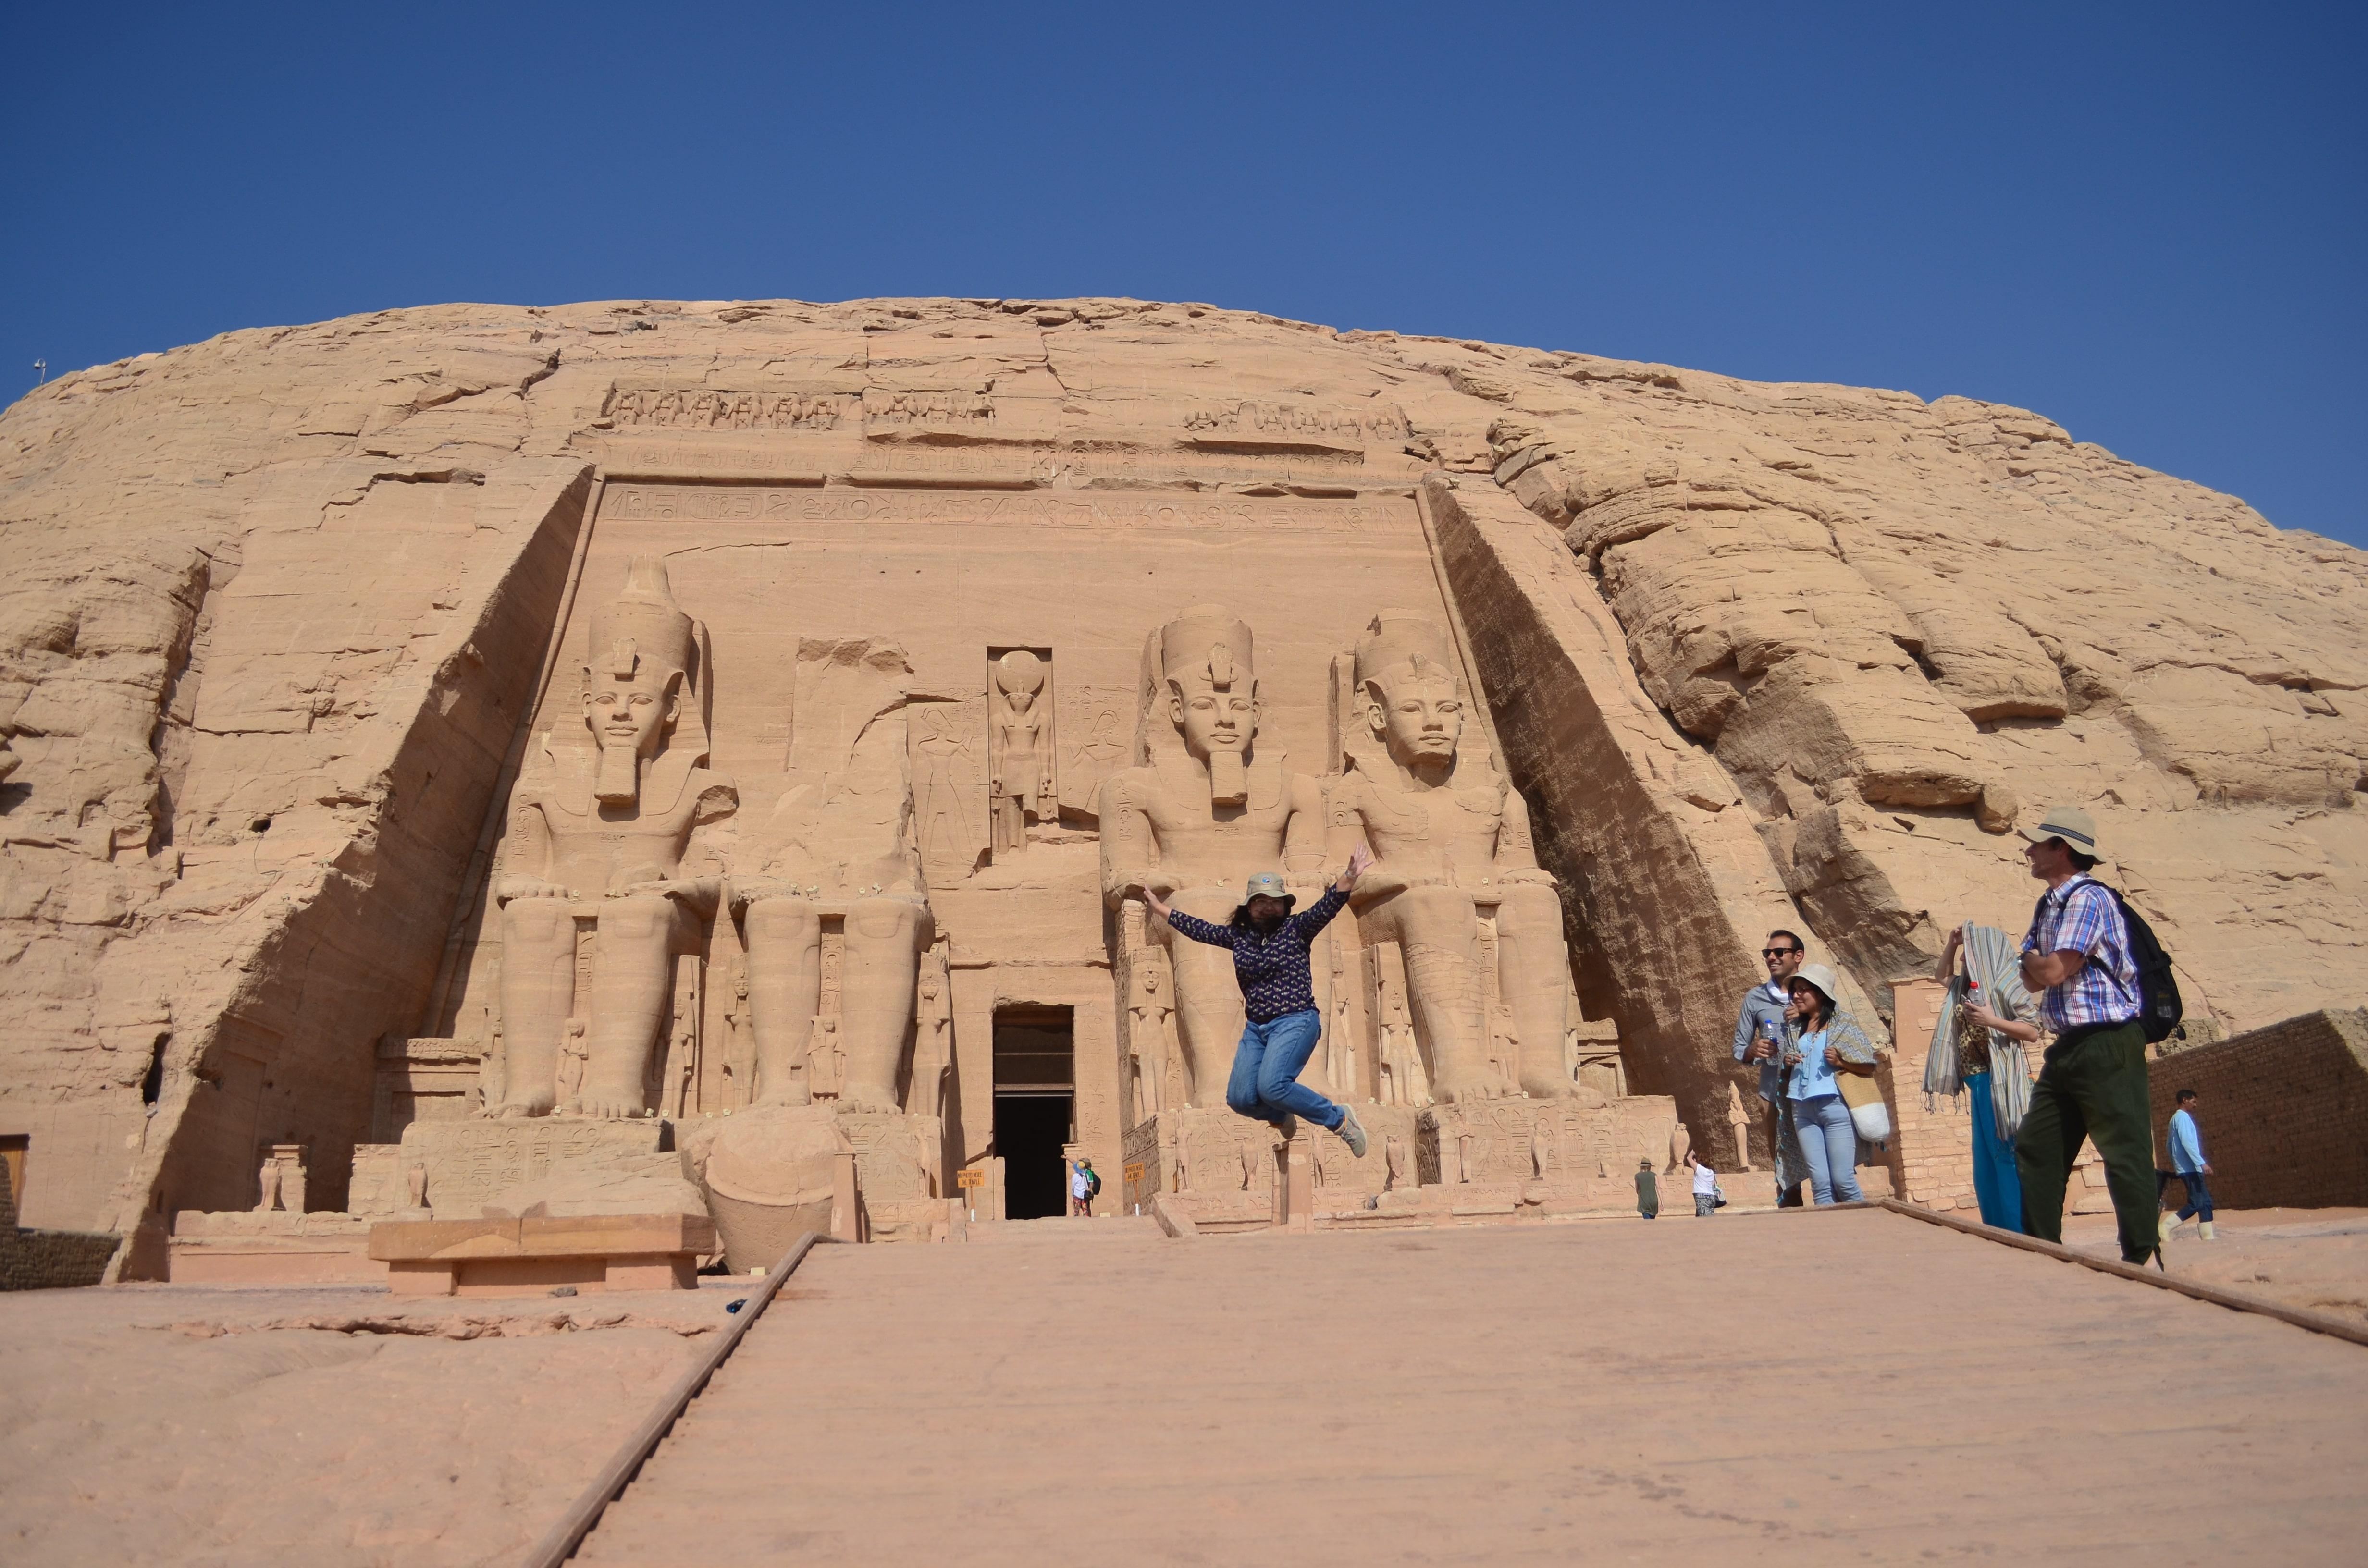 Vista panorámica del Templo de Abu Simbel, al sur de Egipto